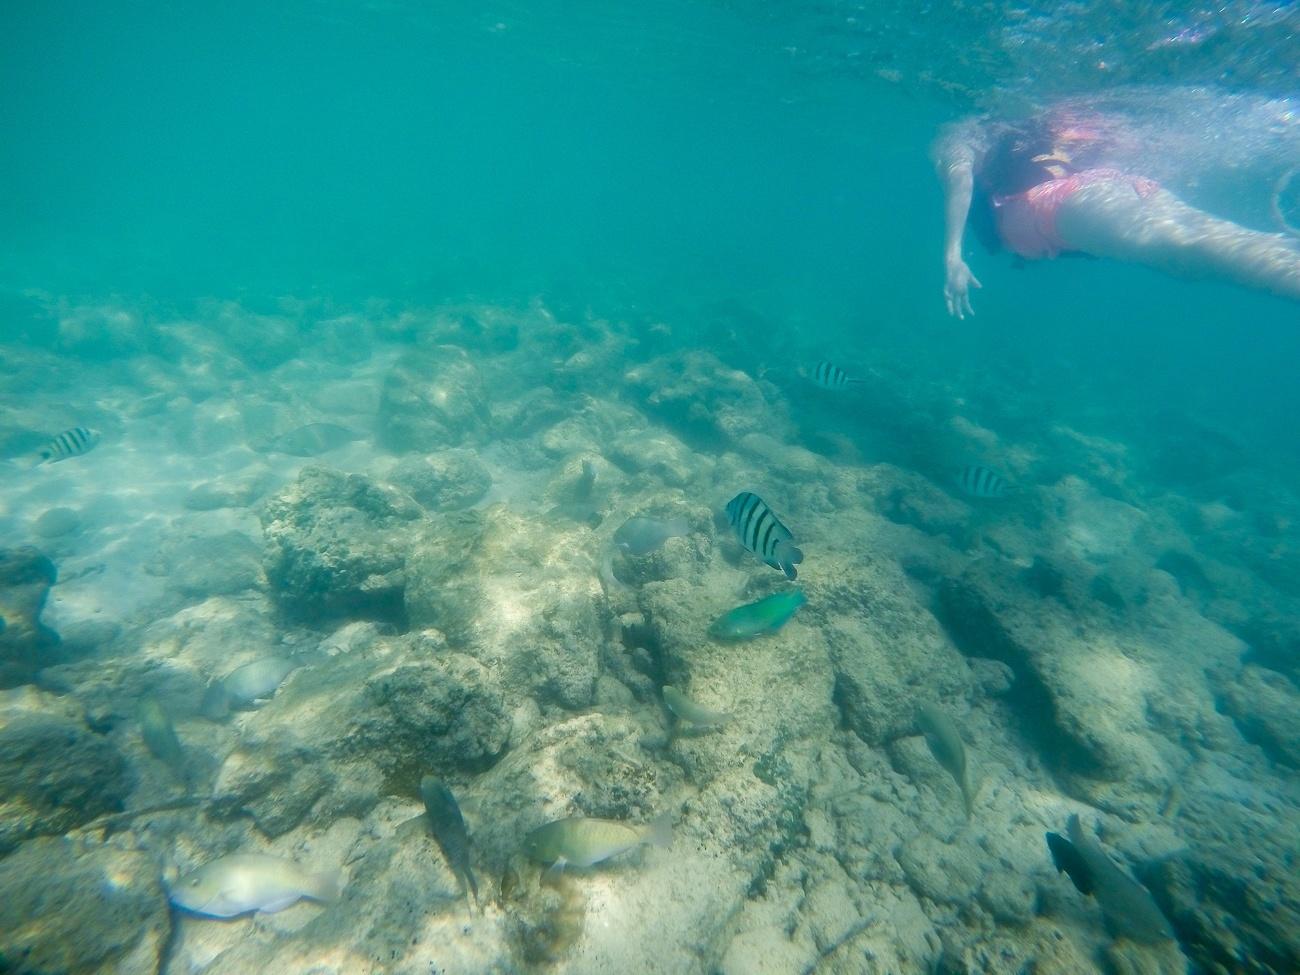 Snorkeling off Mamutik Island in Kota Kinabalu